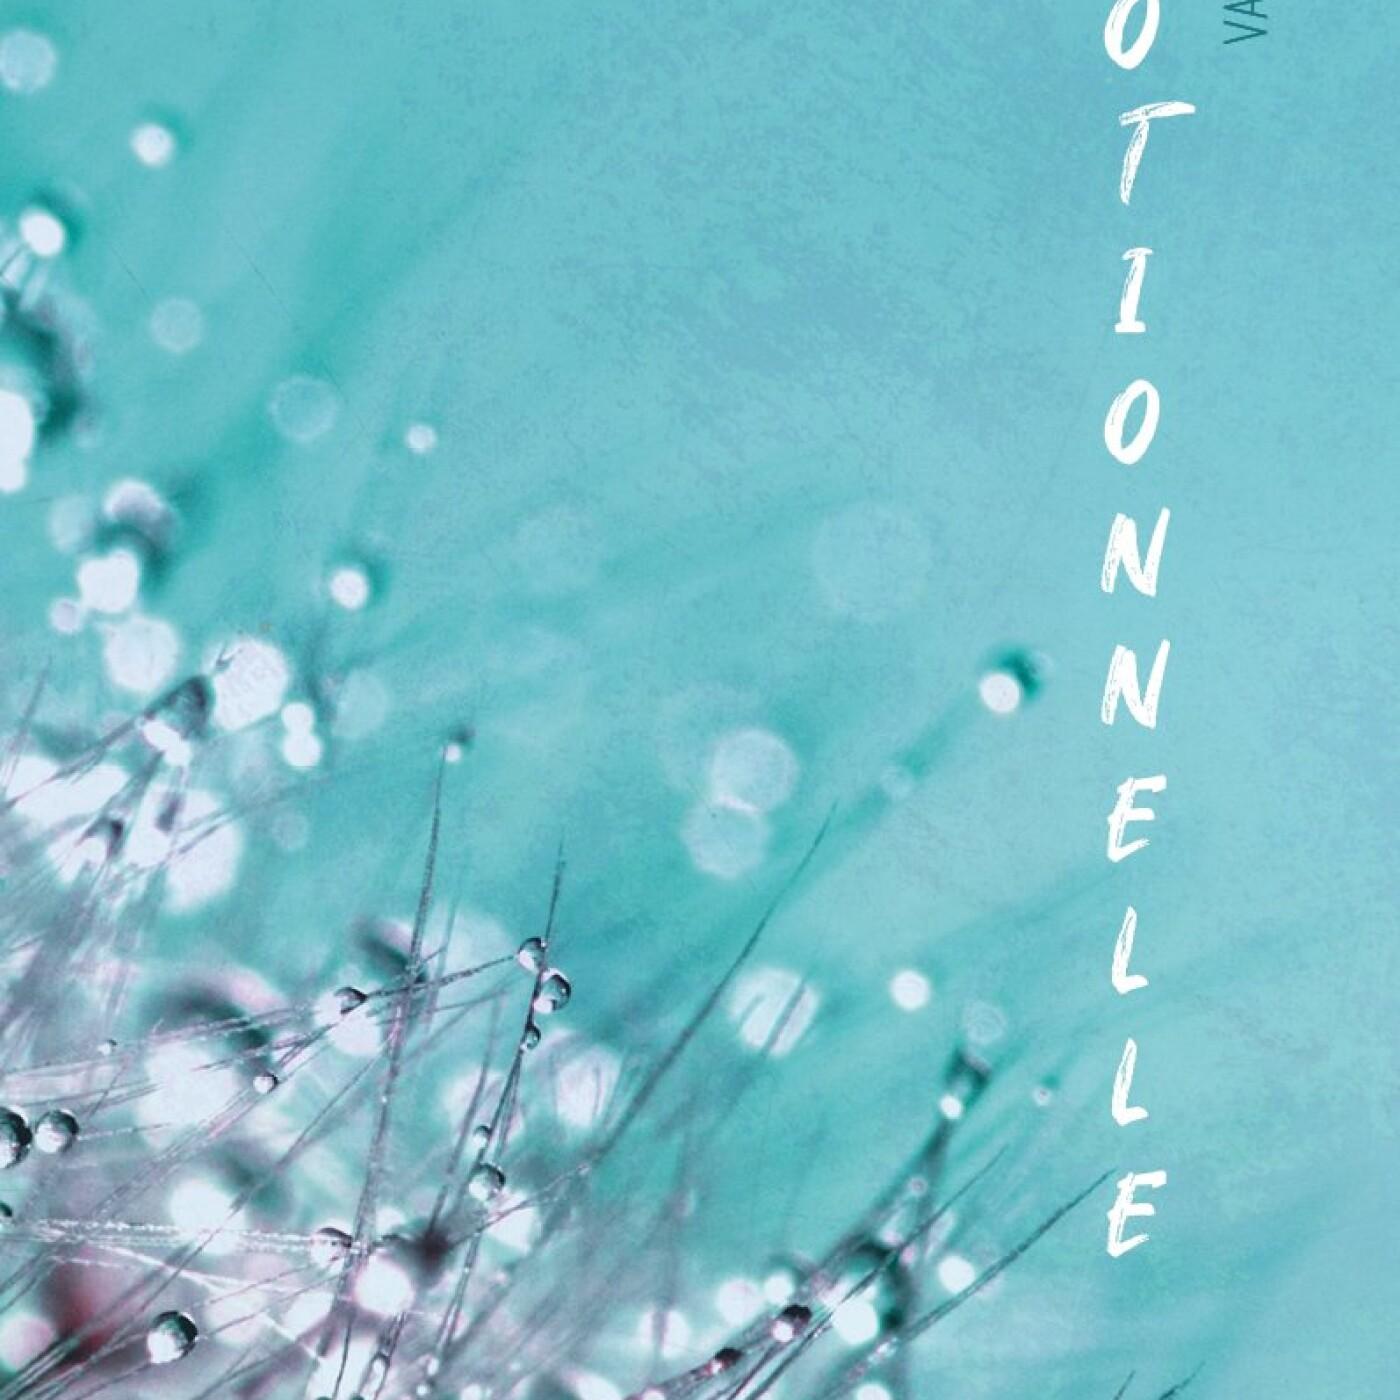 Valentine Sorret présente son livre Emotionnelle - 09 09 2021 - StereoChic Radio